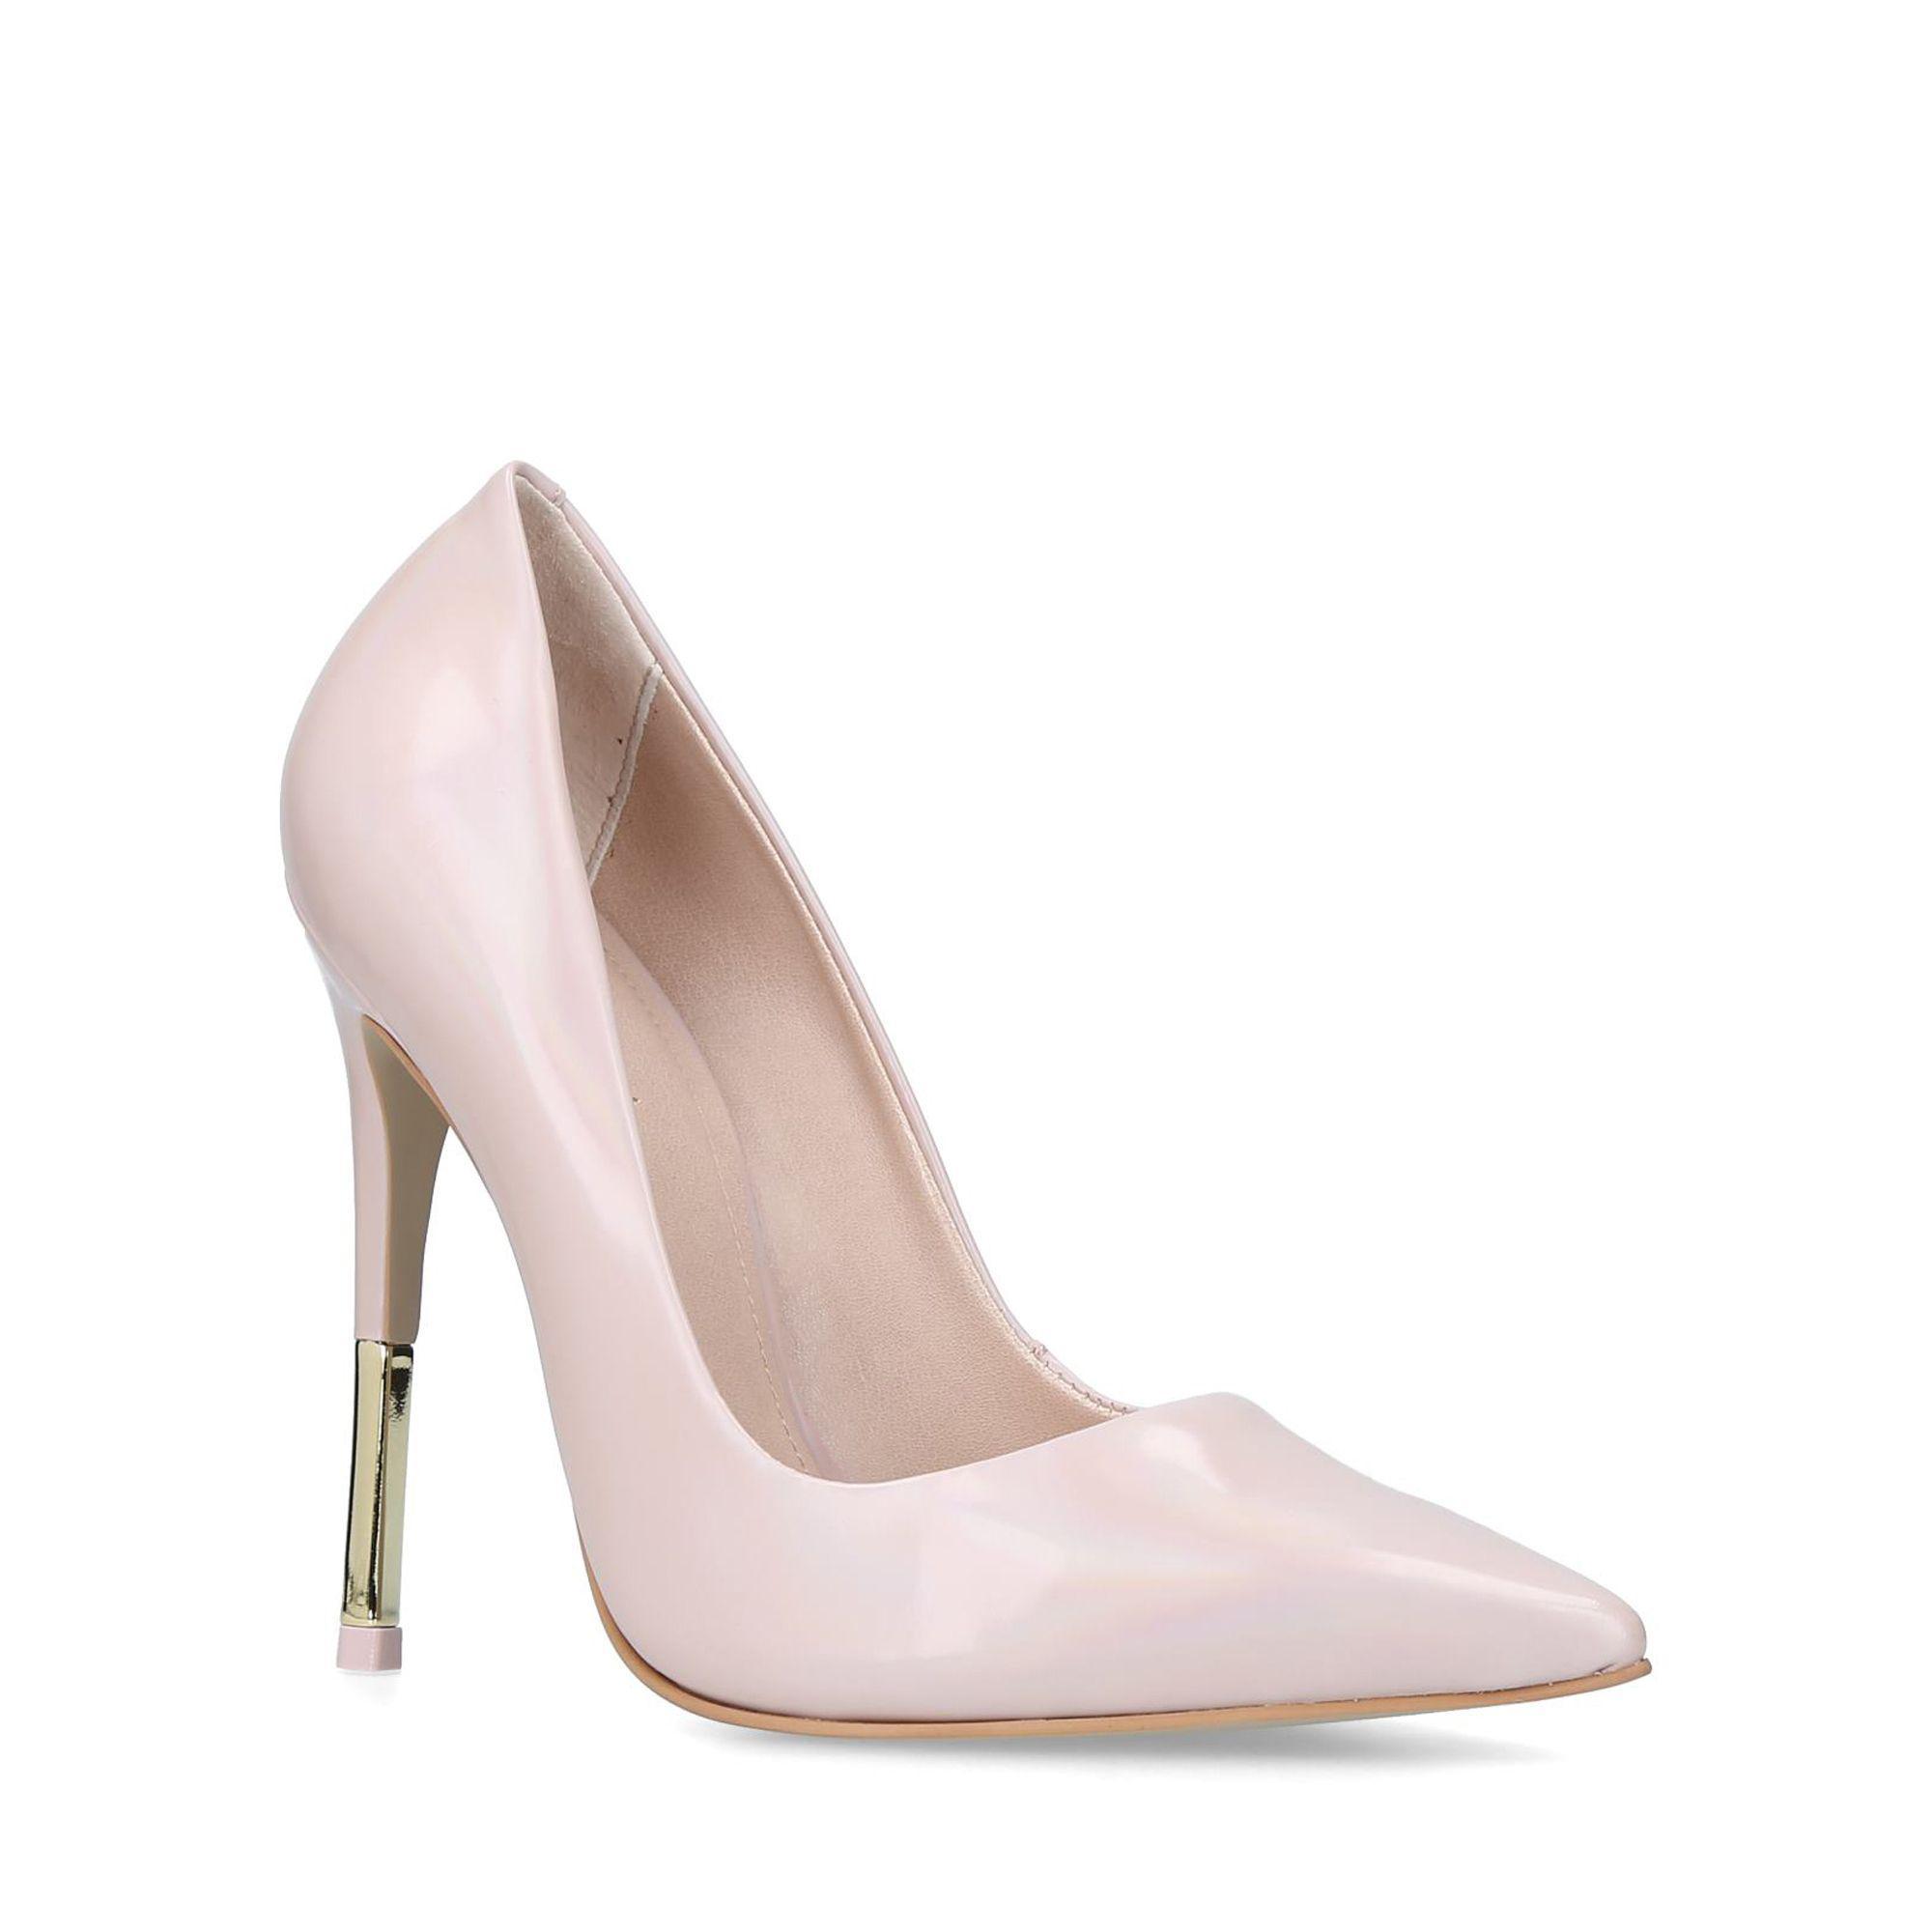 8ec9901f6 Carvela Kurt Geiger. Women s Natural Nude  allie 3  Leather Stiletto Heel  Court Shoes